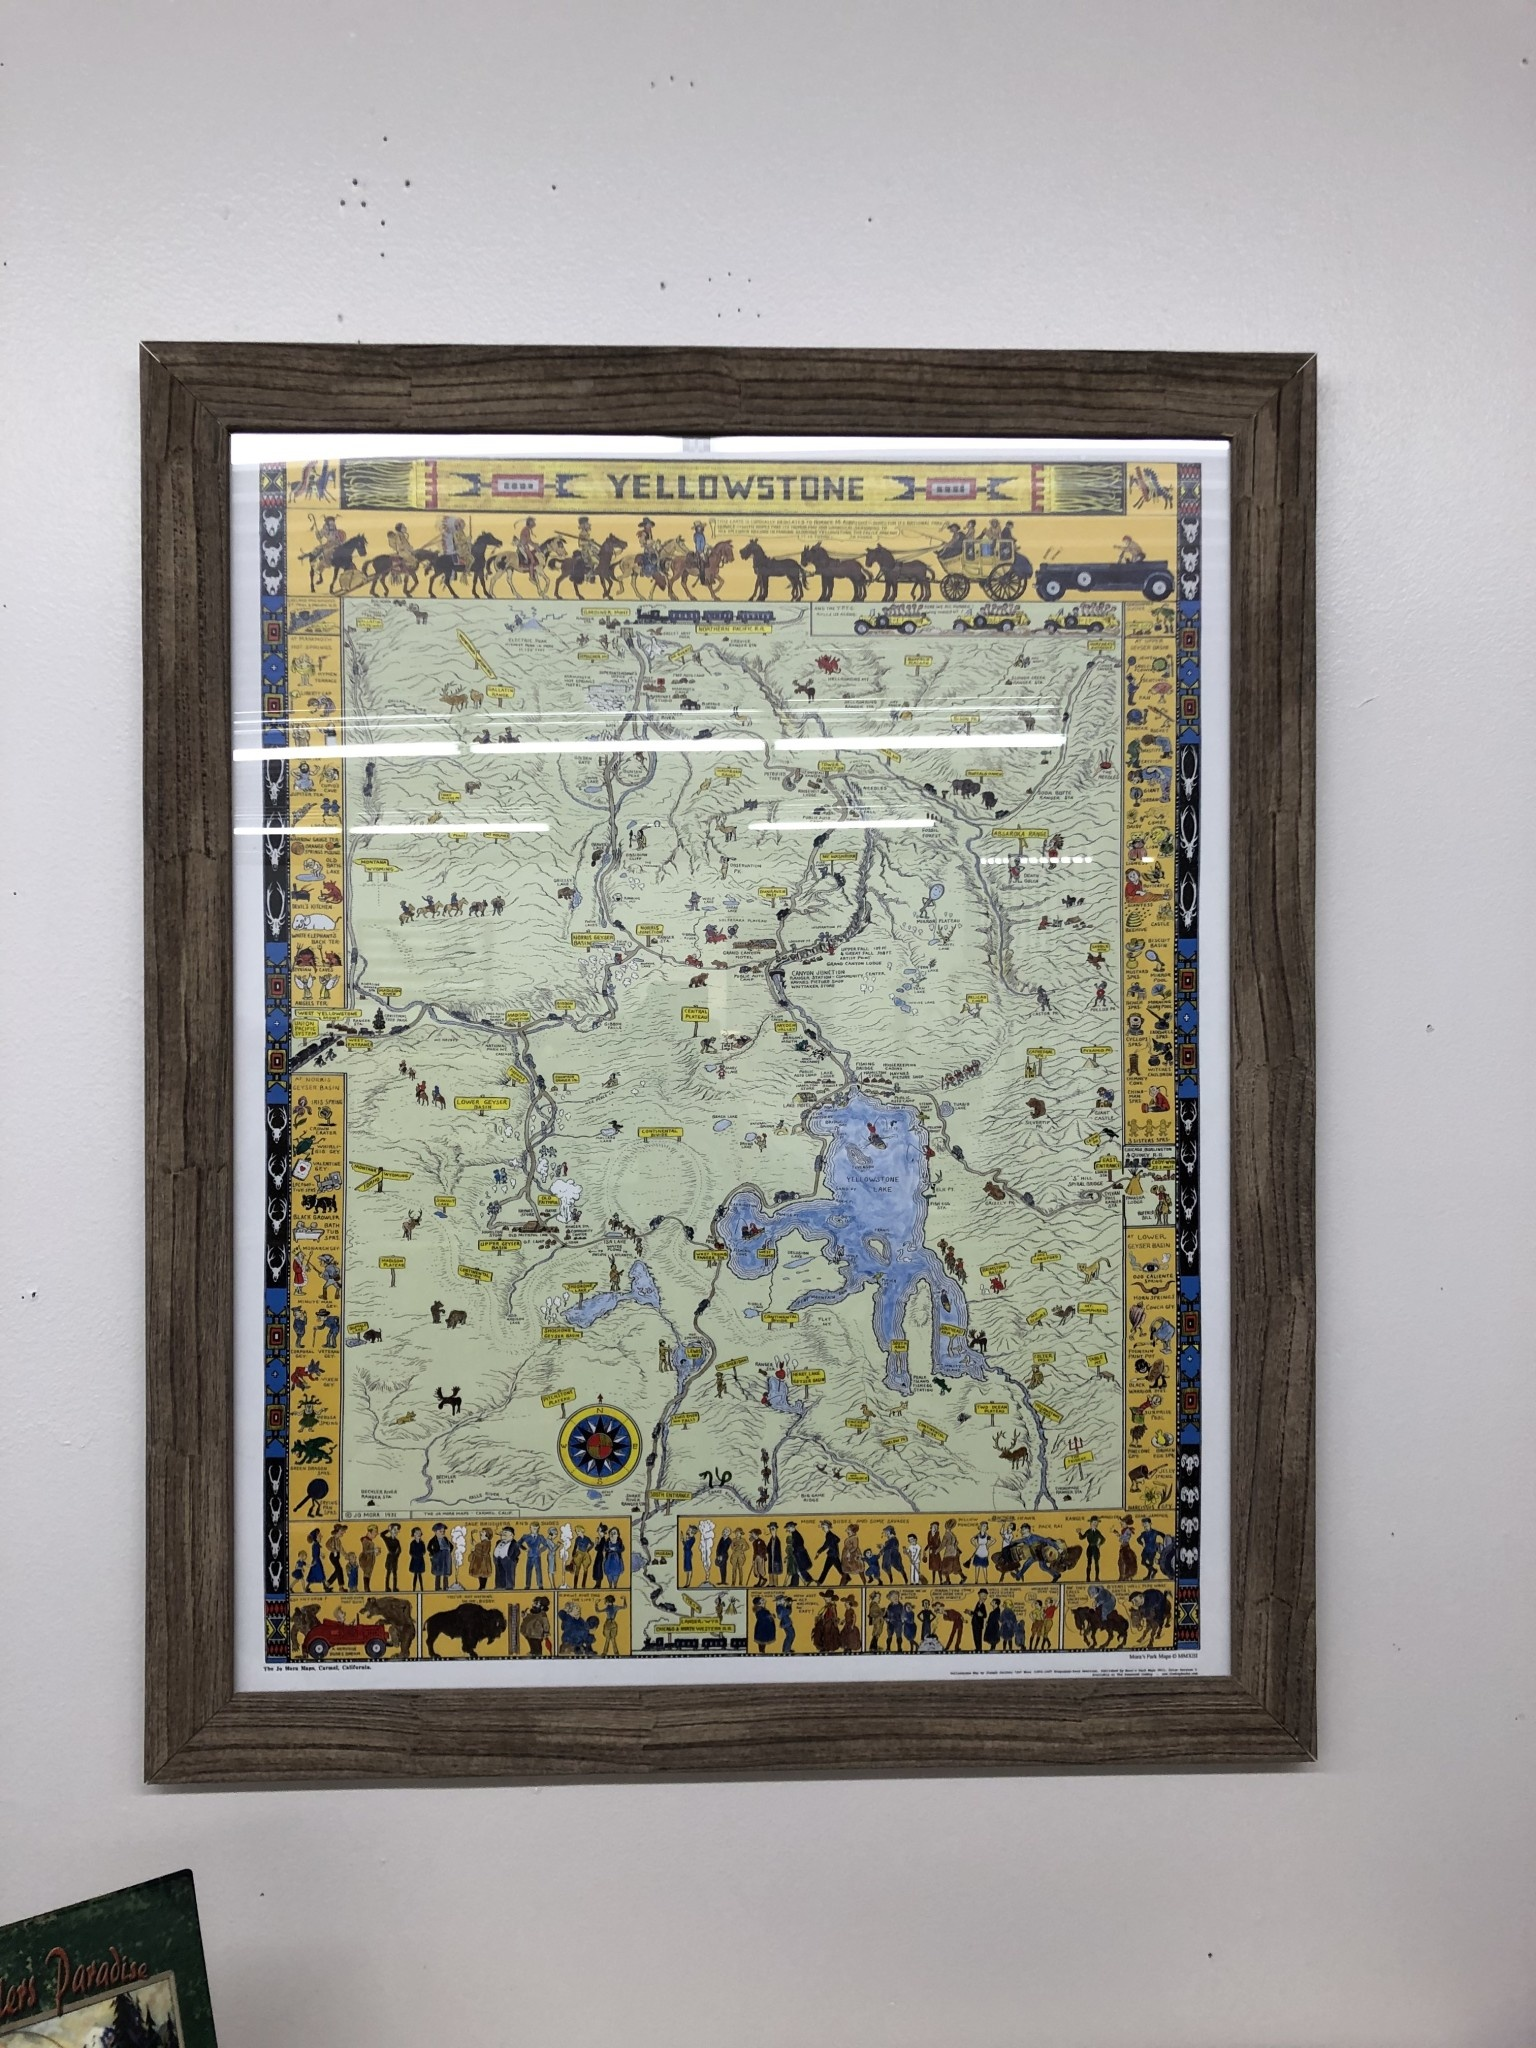 Chuck Lewis Yellowstone Map